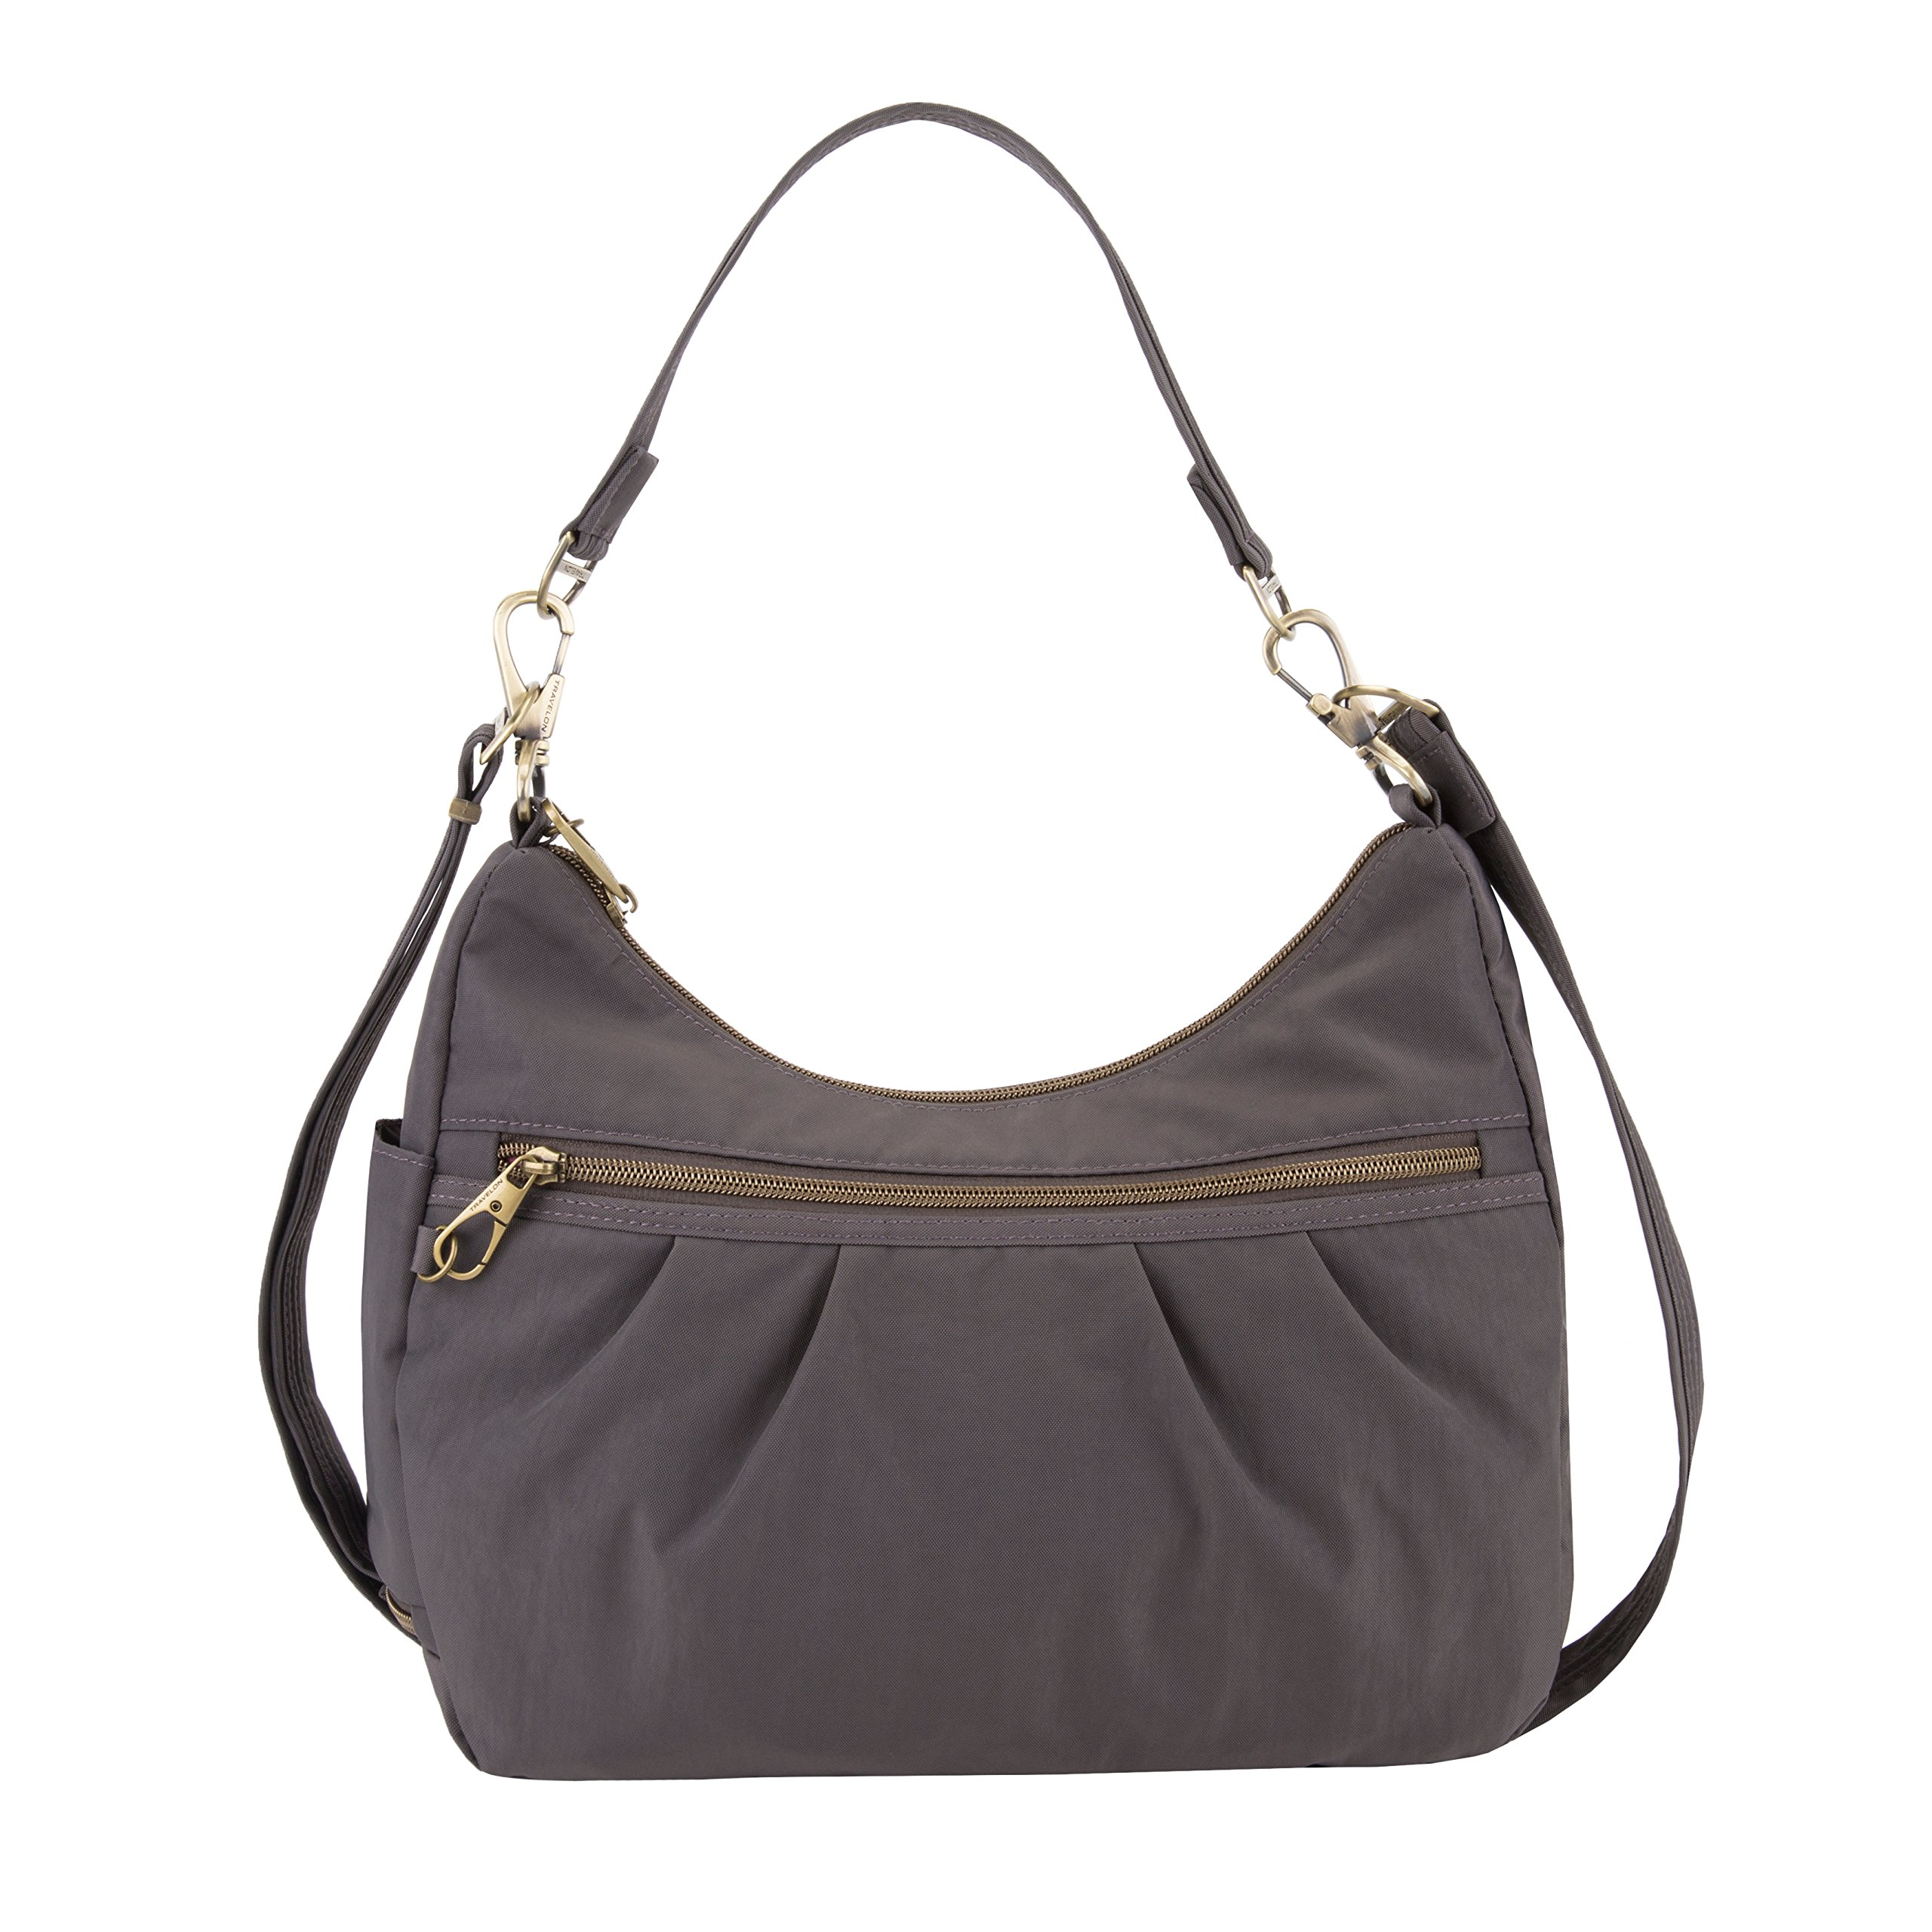 Travelon Anti-theft Signature Hobo Bag, Smoke